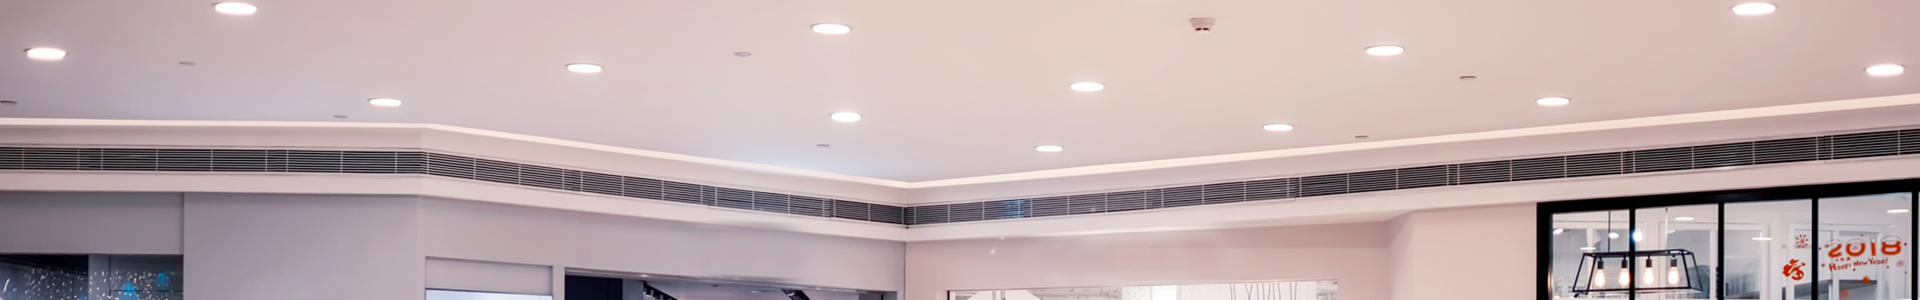 6 inch led downlight